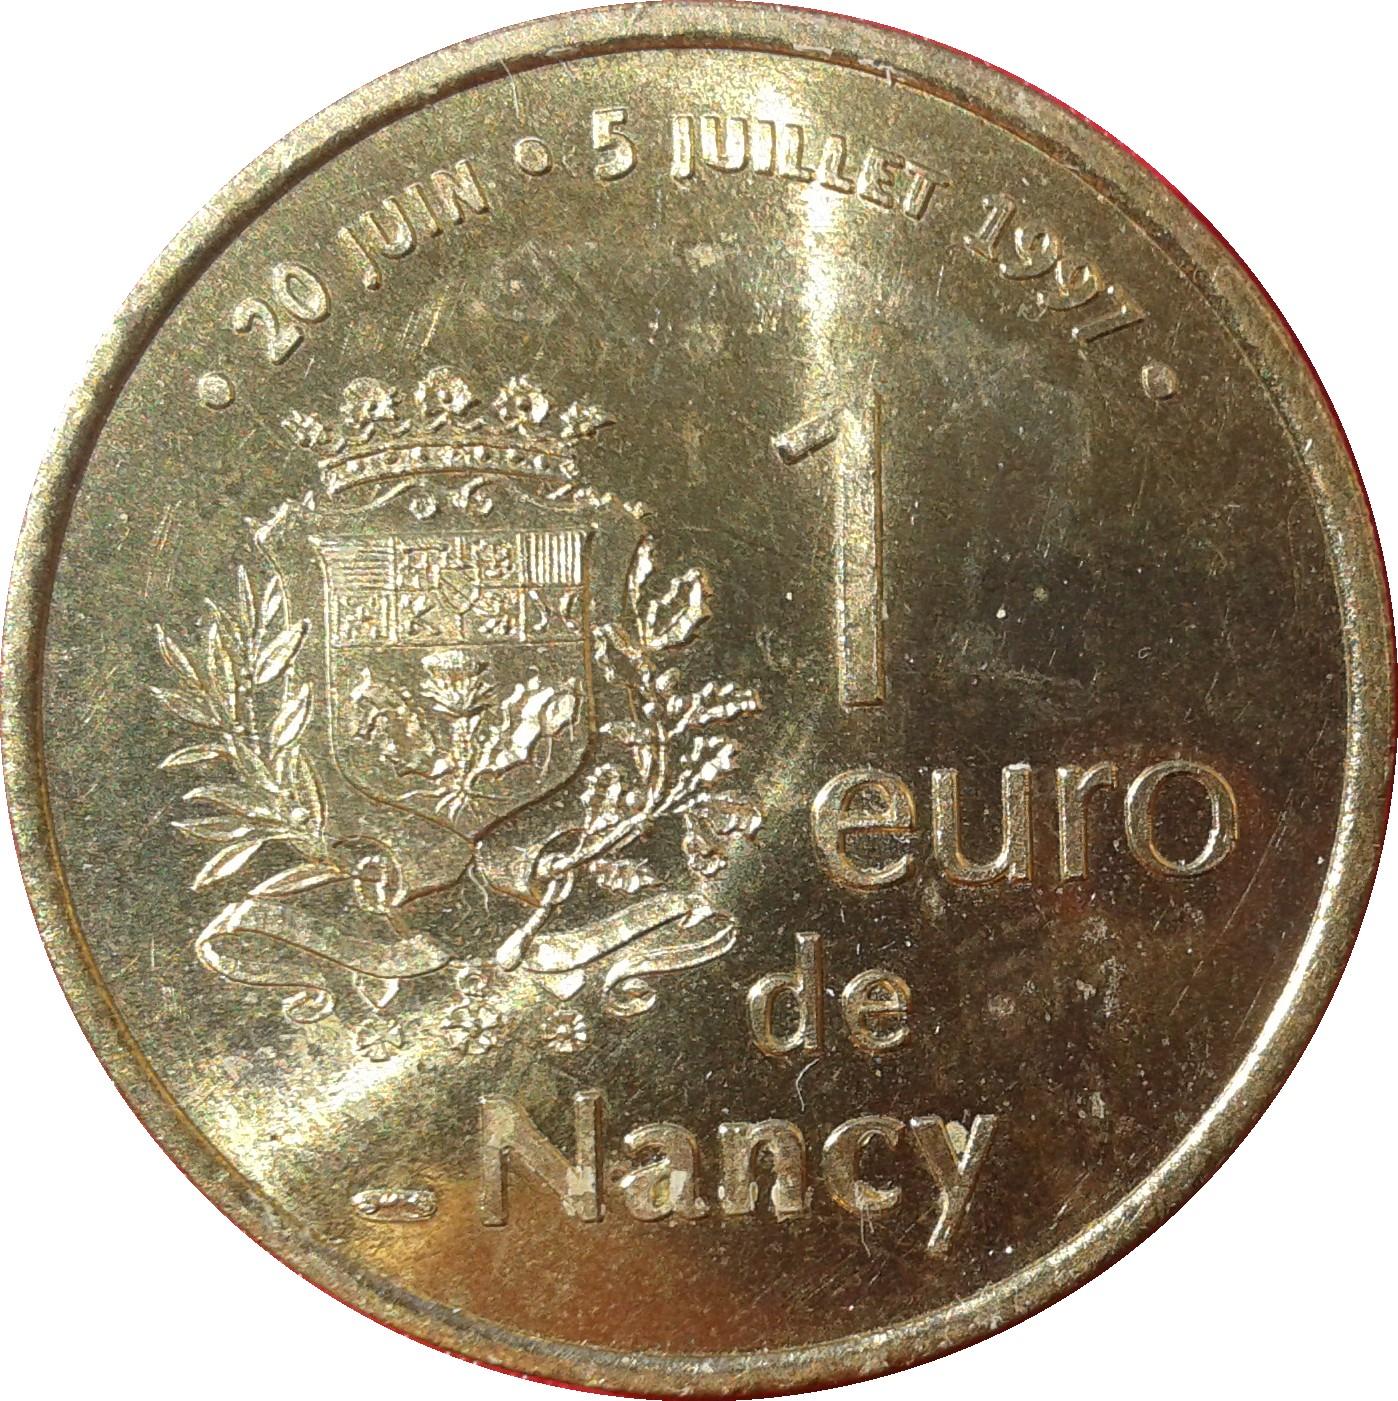 1 euro de nancy 54 jetons numista. Black Bedroom Furniture Sets. Home Design Ideas